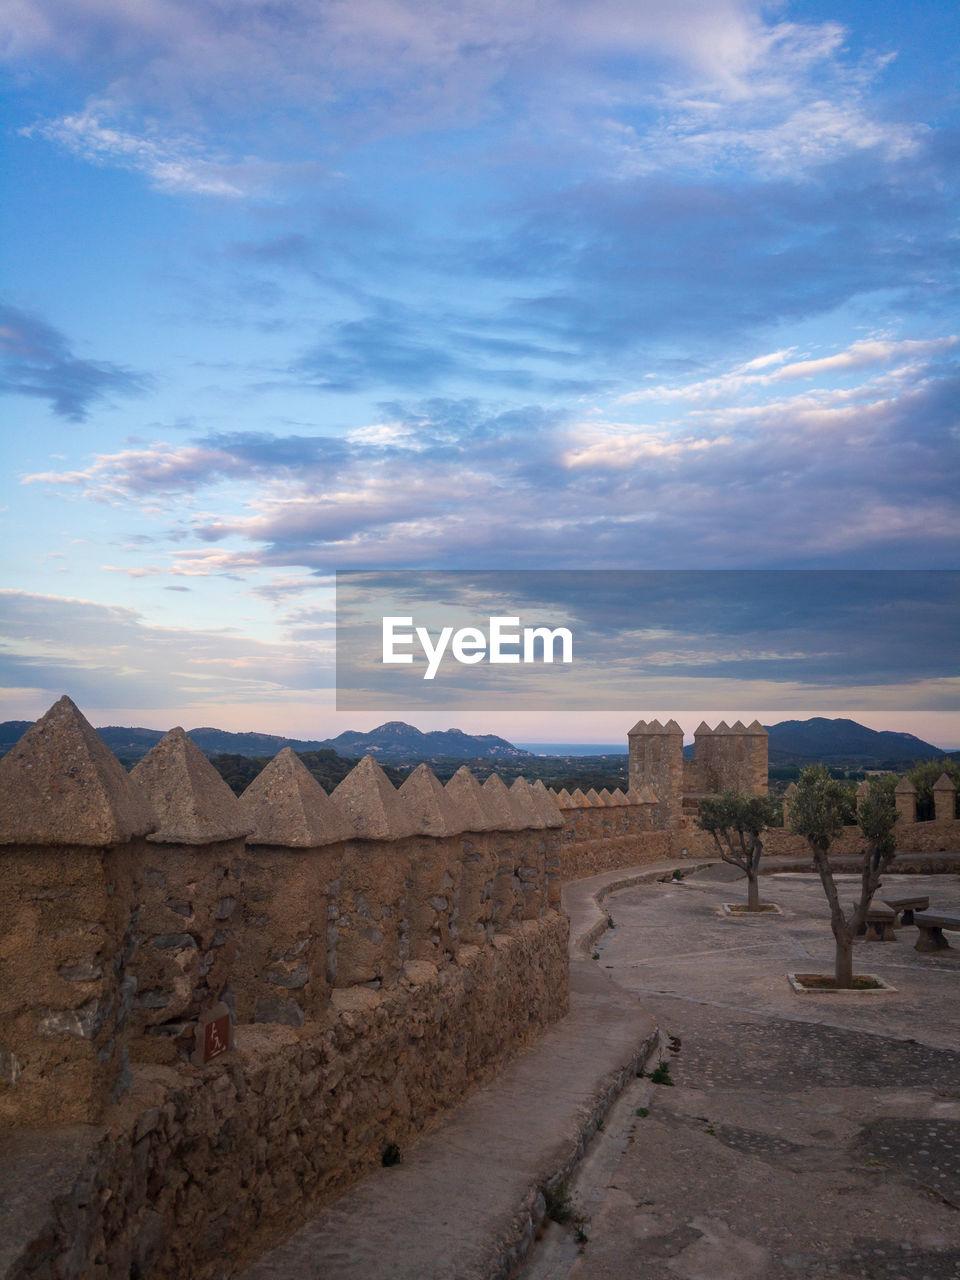 Defensive wall of castle sant salvador in the city of arta on balearic island majorca mallorc, spain